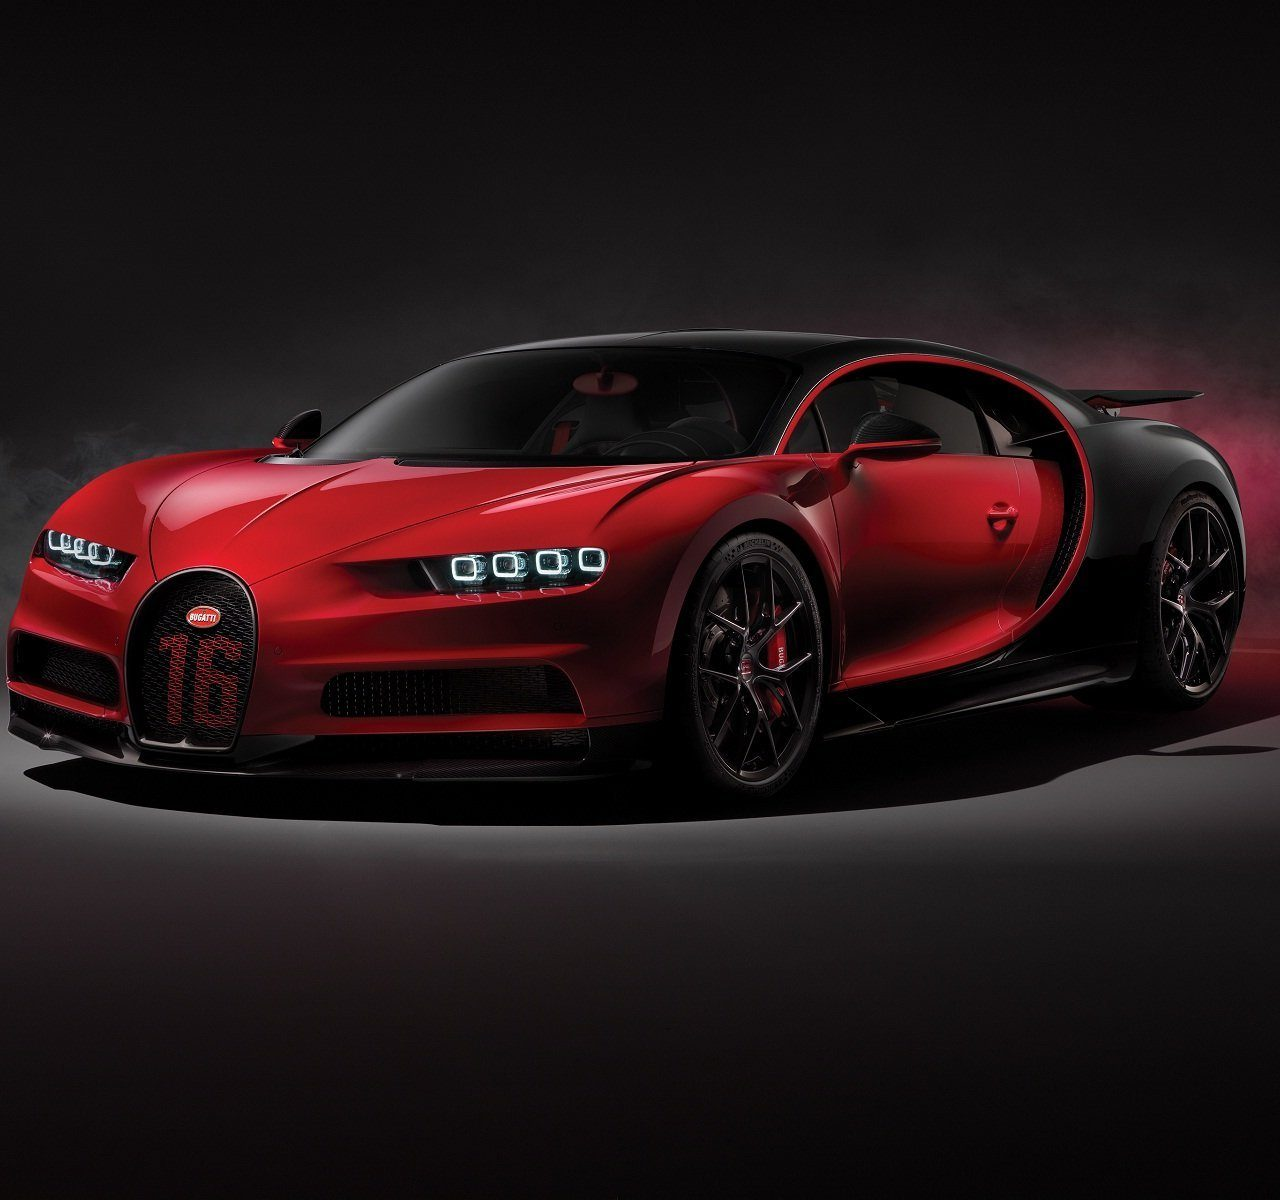 Bugatti Chiron Wallpaper Hd 1280x1200 Download Hd Wallpaper Wallpapertip